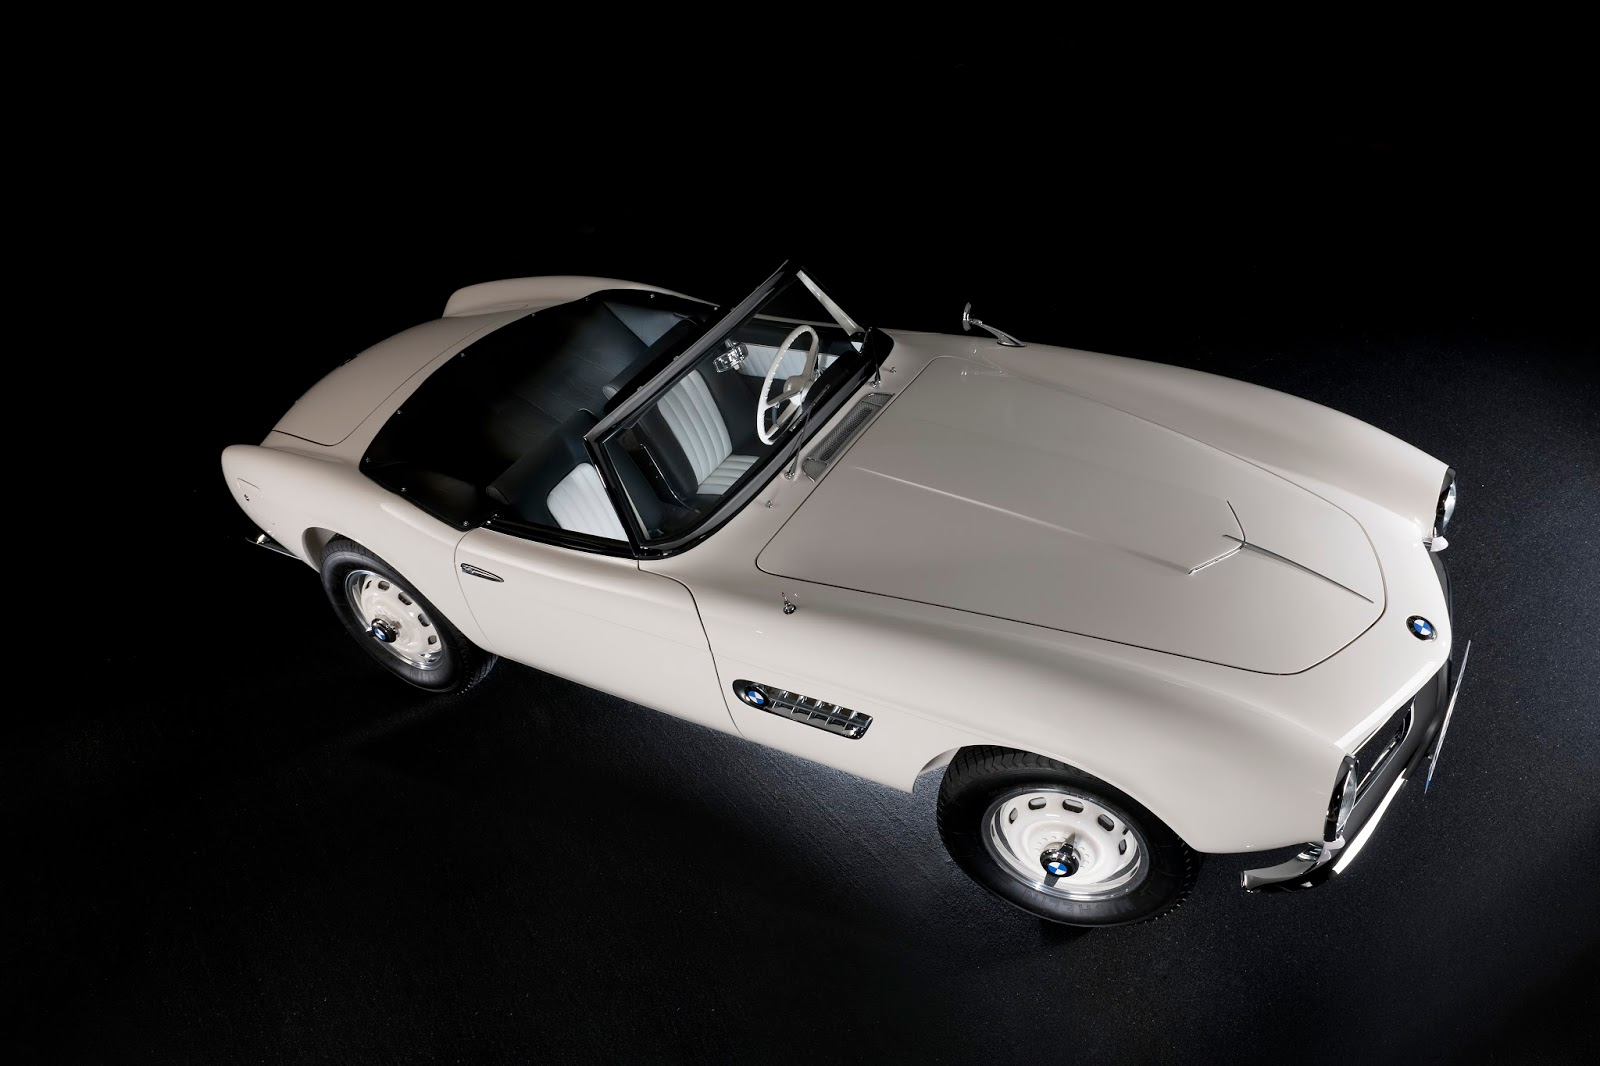 P90229720 highRes elvis bmw 507 08 201 Η επιστροφή της μυθικής BMW 507 του Elvis στο Concours d'Elegance, Pebble Beach autoshow, BMW, BMW 507, Classic, Concours d'Elegance, Roadster, zblog